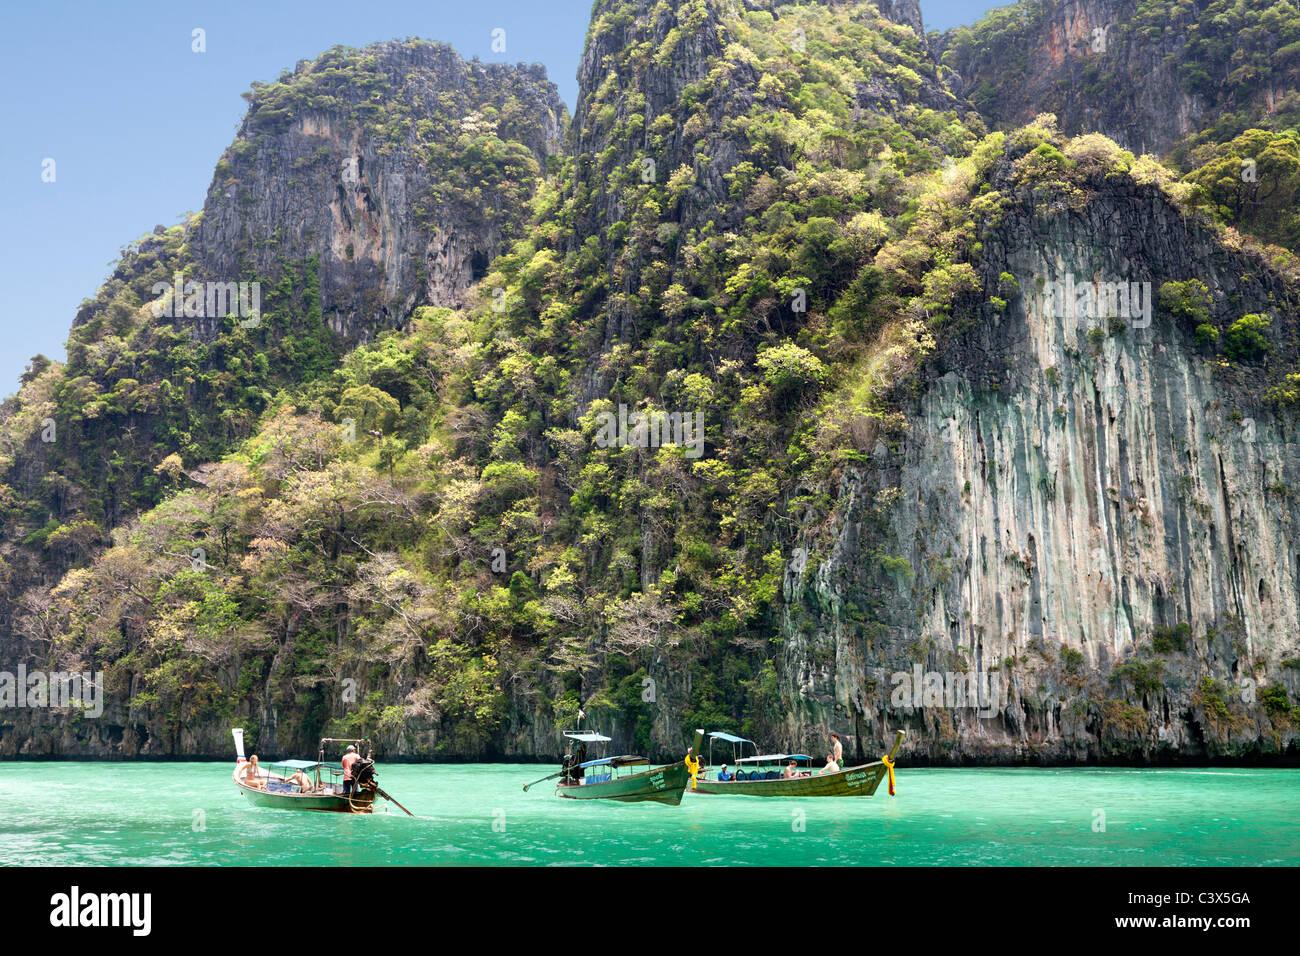 Tourist boats cruising Phang Nga Bay, Phuket Thailand 2 - Stock Image